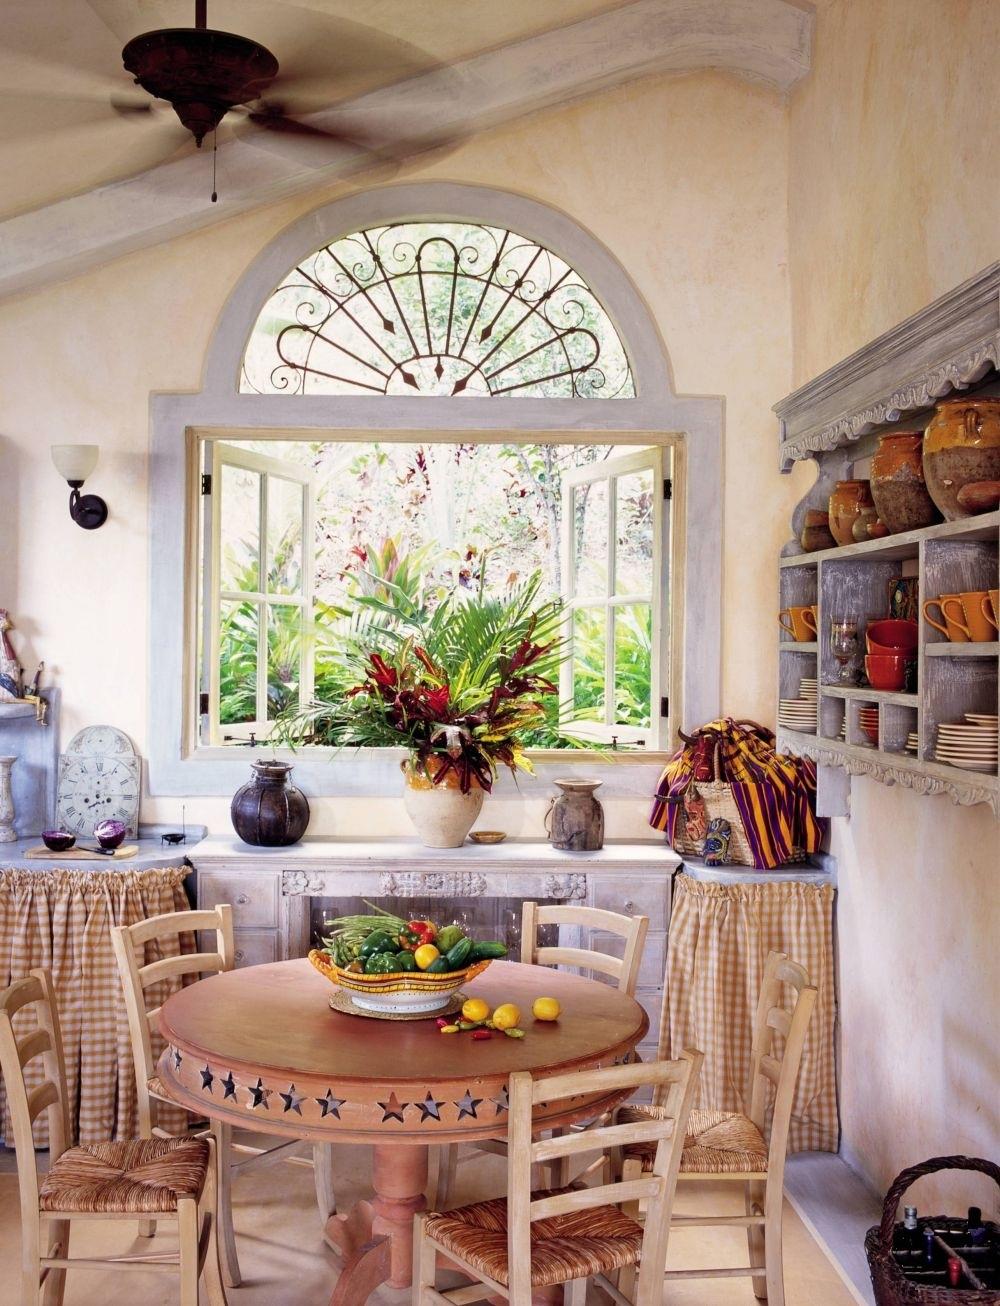 adelaparvu.com despre casa mica romantica, decor eclectic, casa Panama, design interior Diane Burn, Foto Michael Calderwood (7)